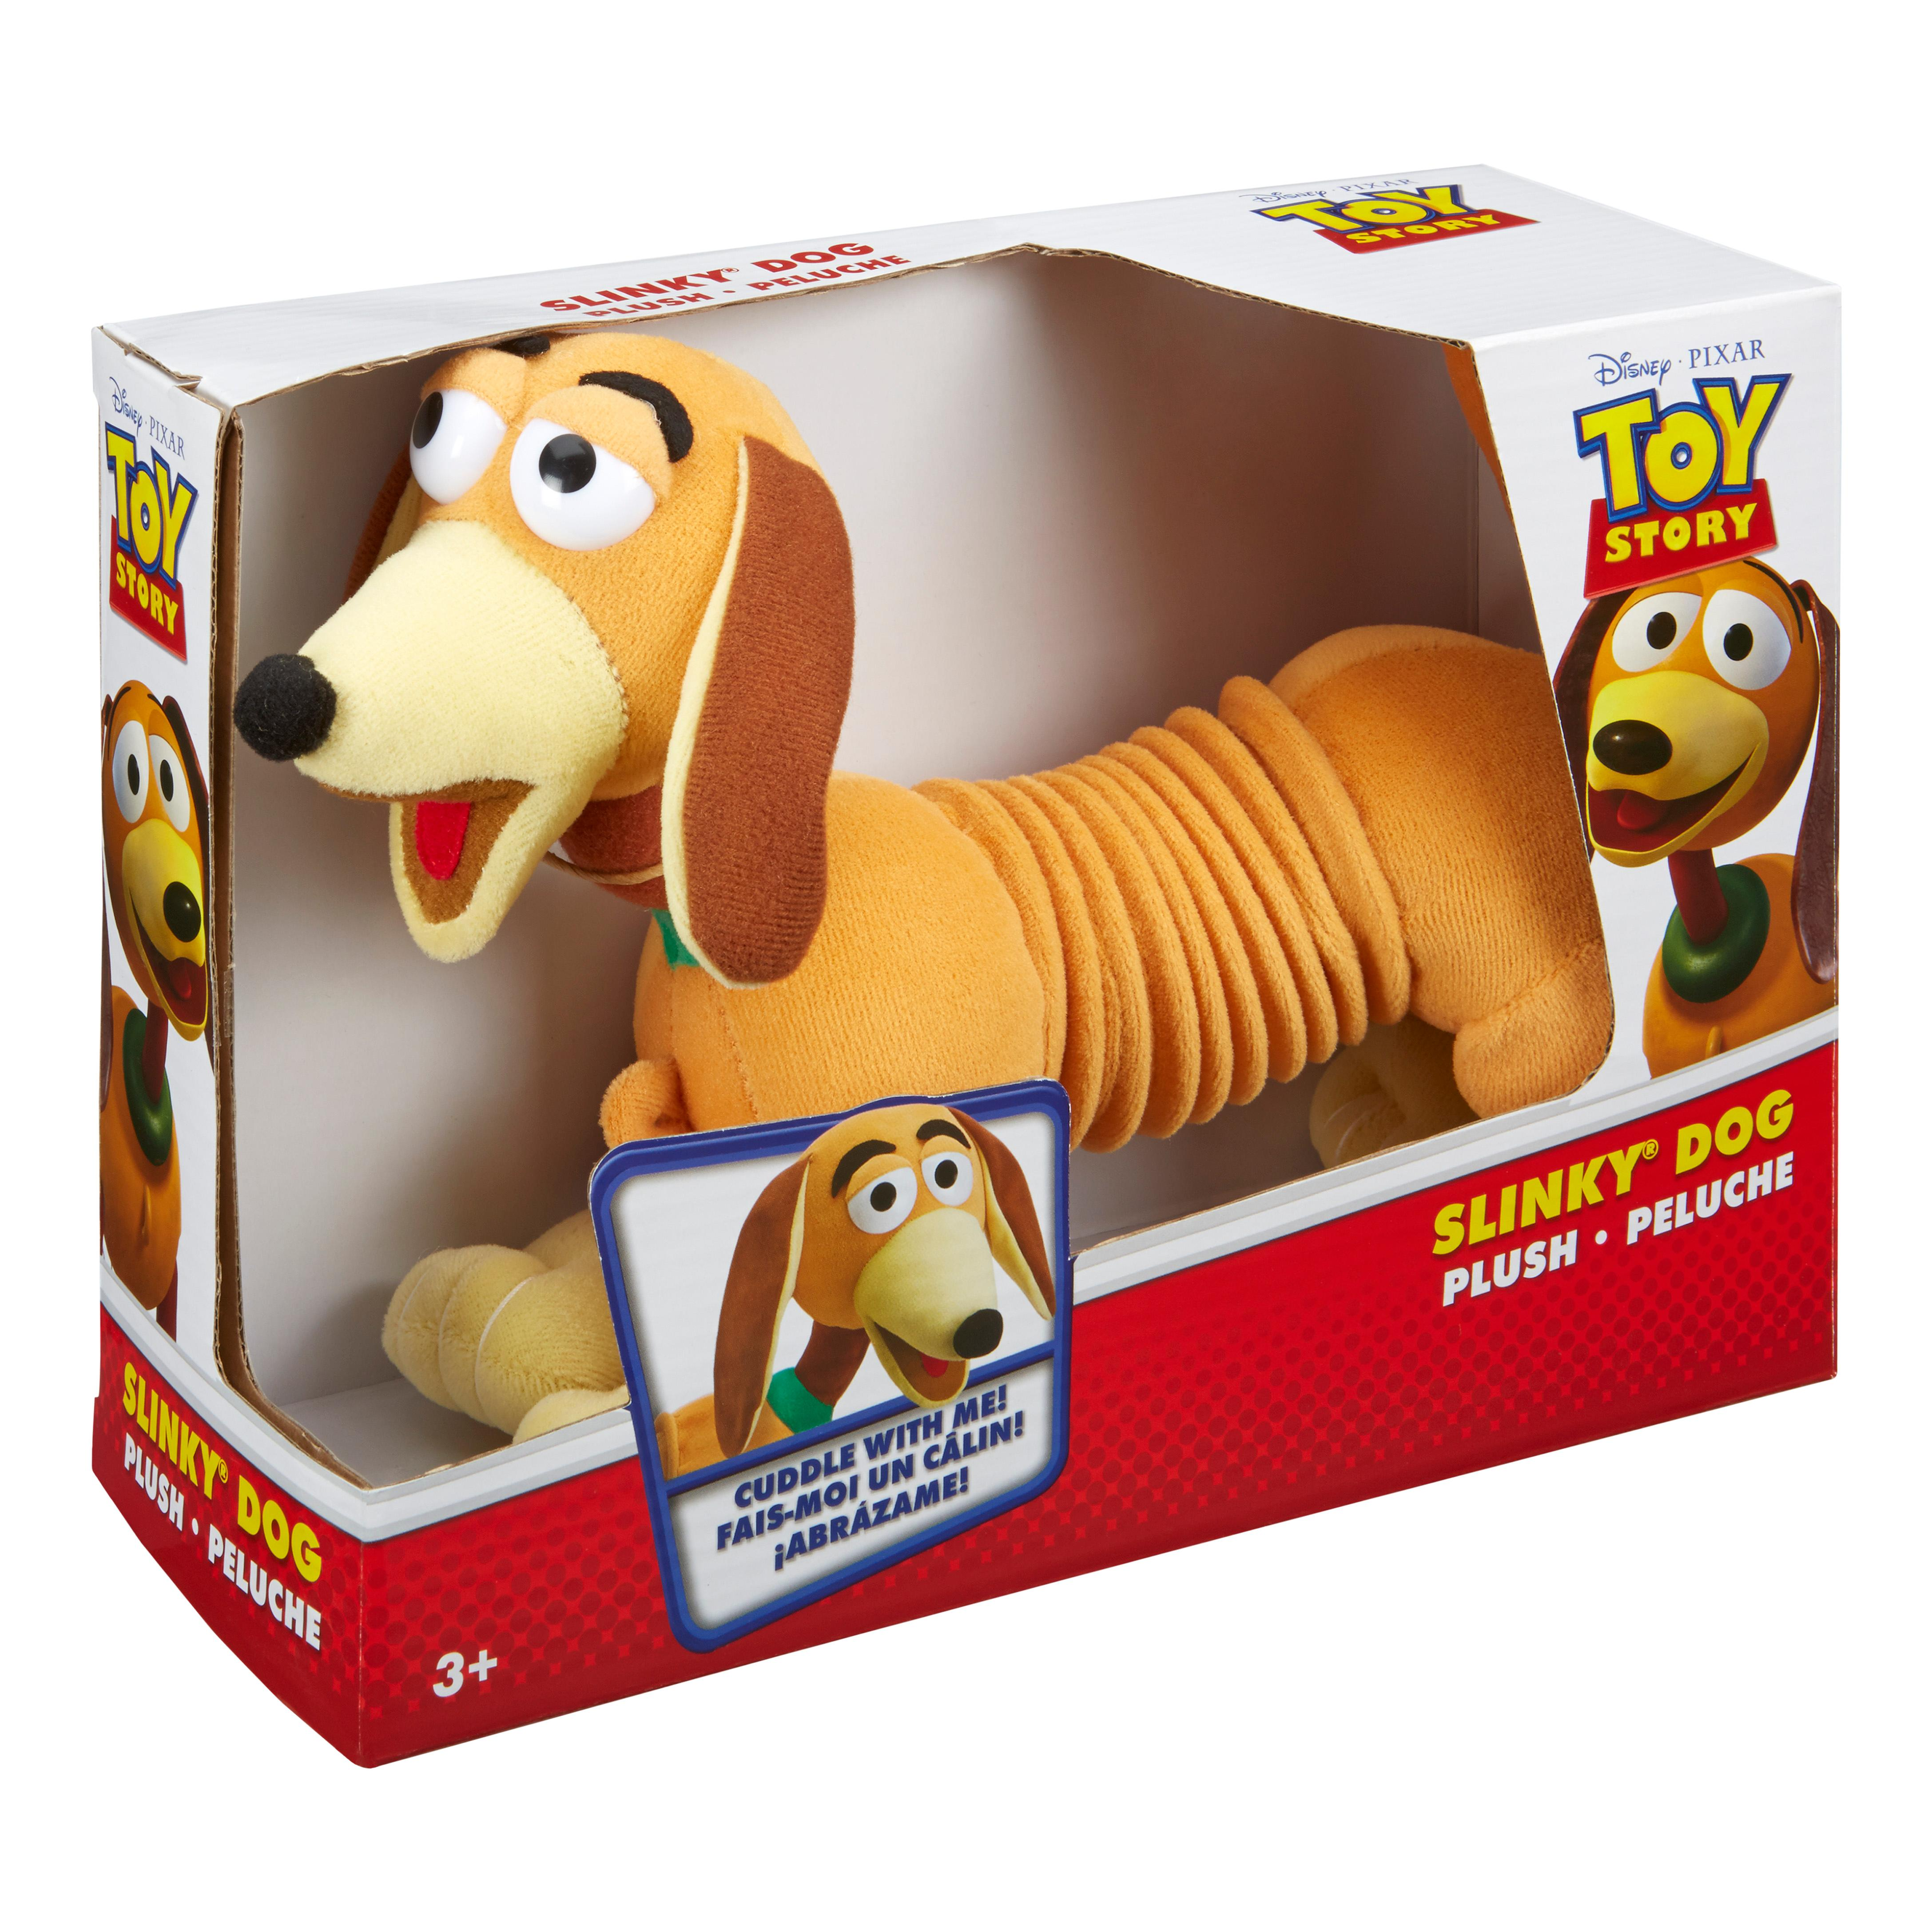 Amazon Disney Pixar Toy Story Plush Slinky Dog Toys & Games